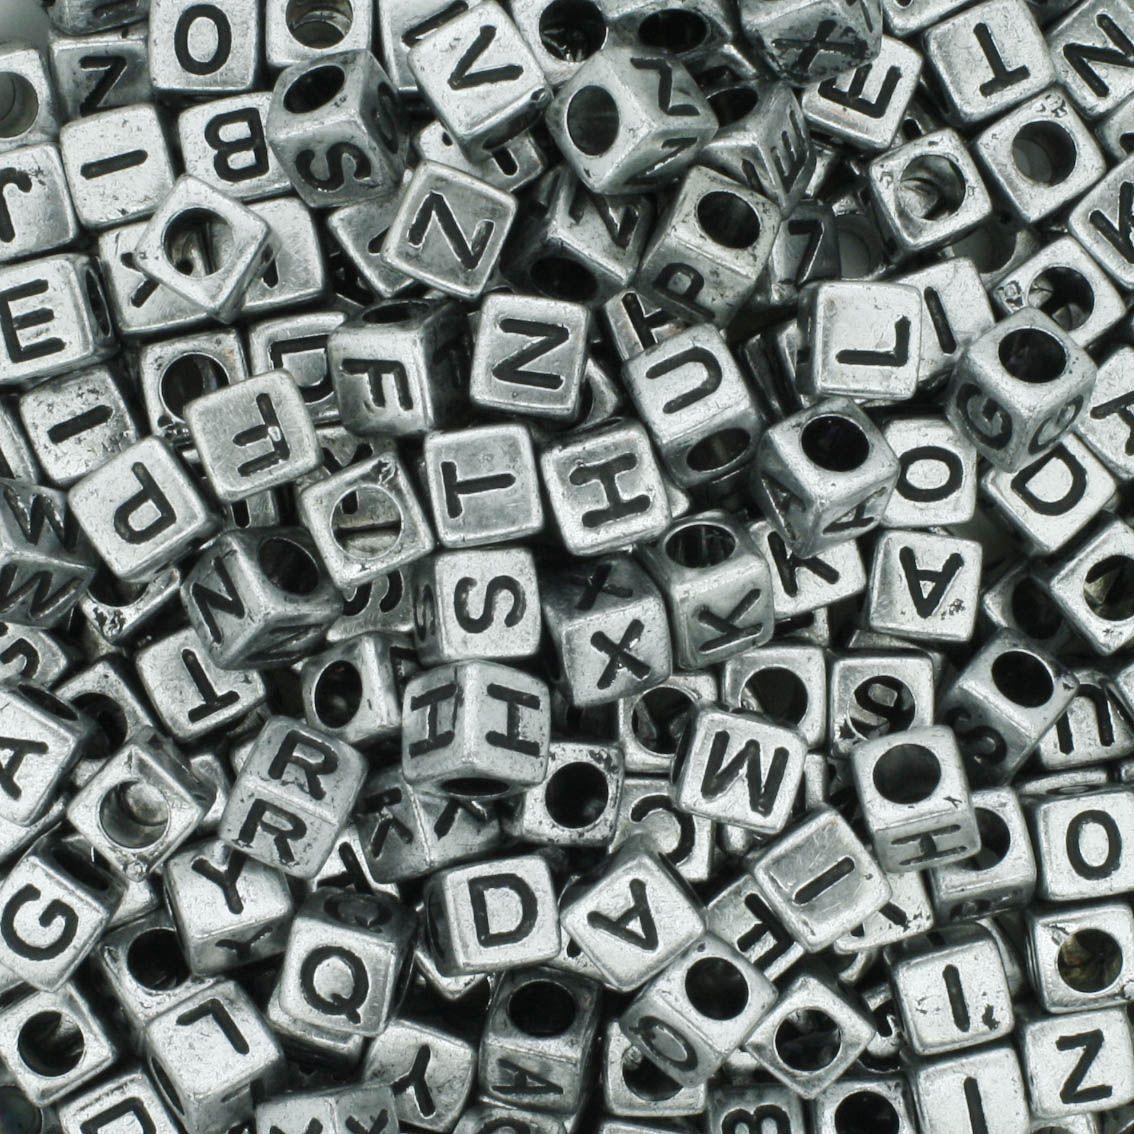 Miçanga - Letras Cubo Prateada  - Stéphanie Bijoux® - Peças para Bijuterias e Artesanato